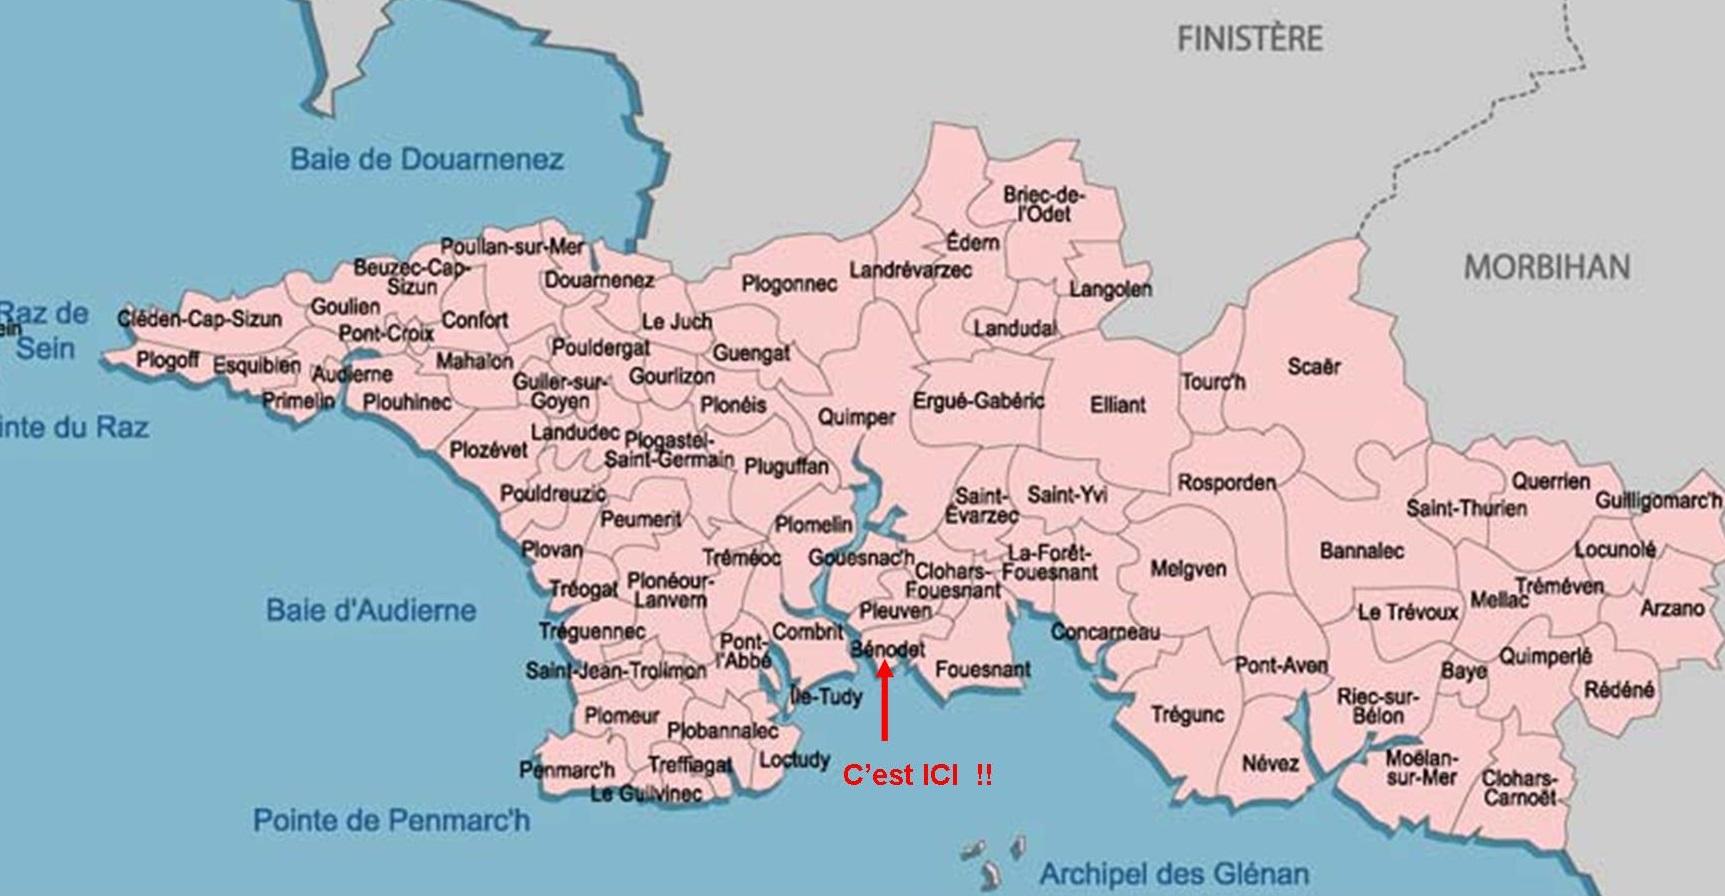 carte-du-finistere-sud